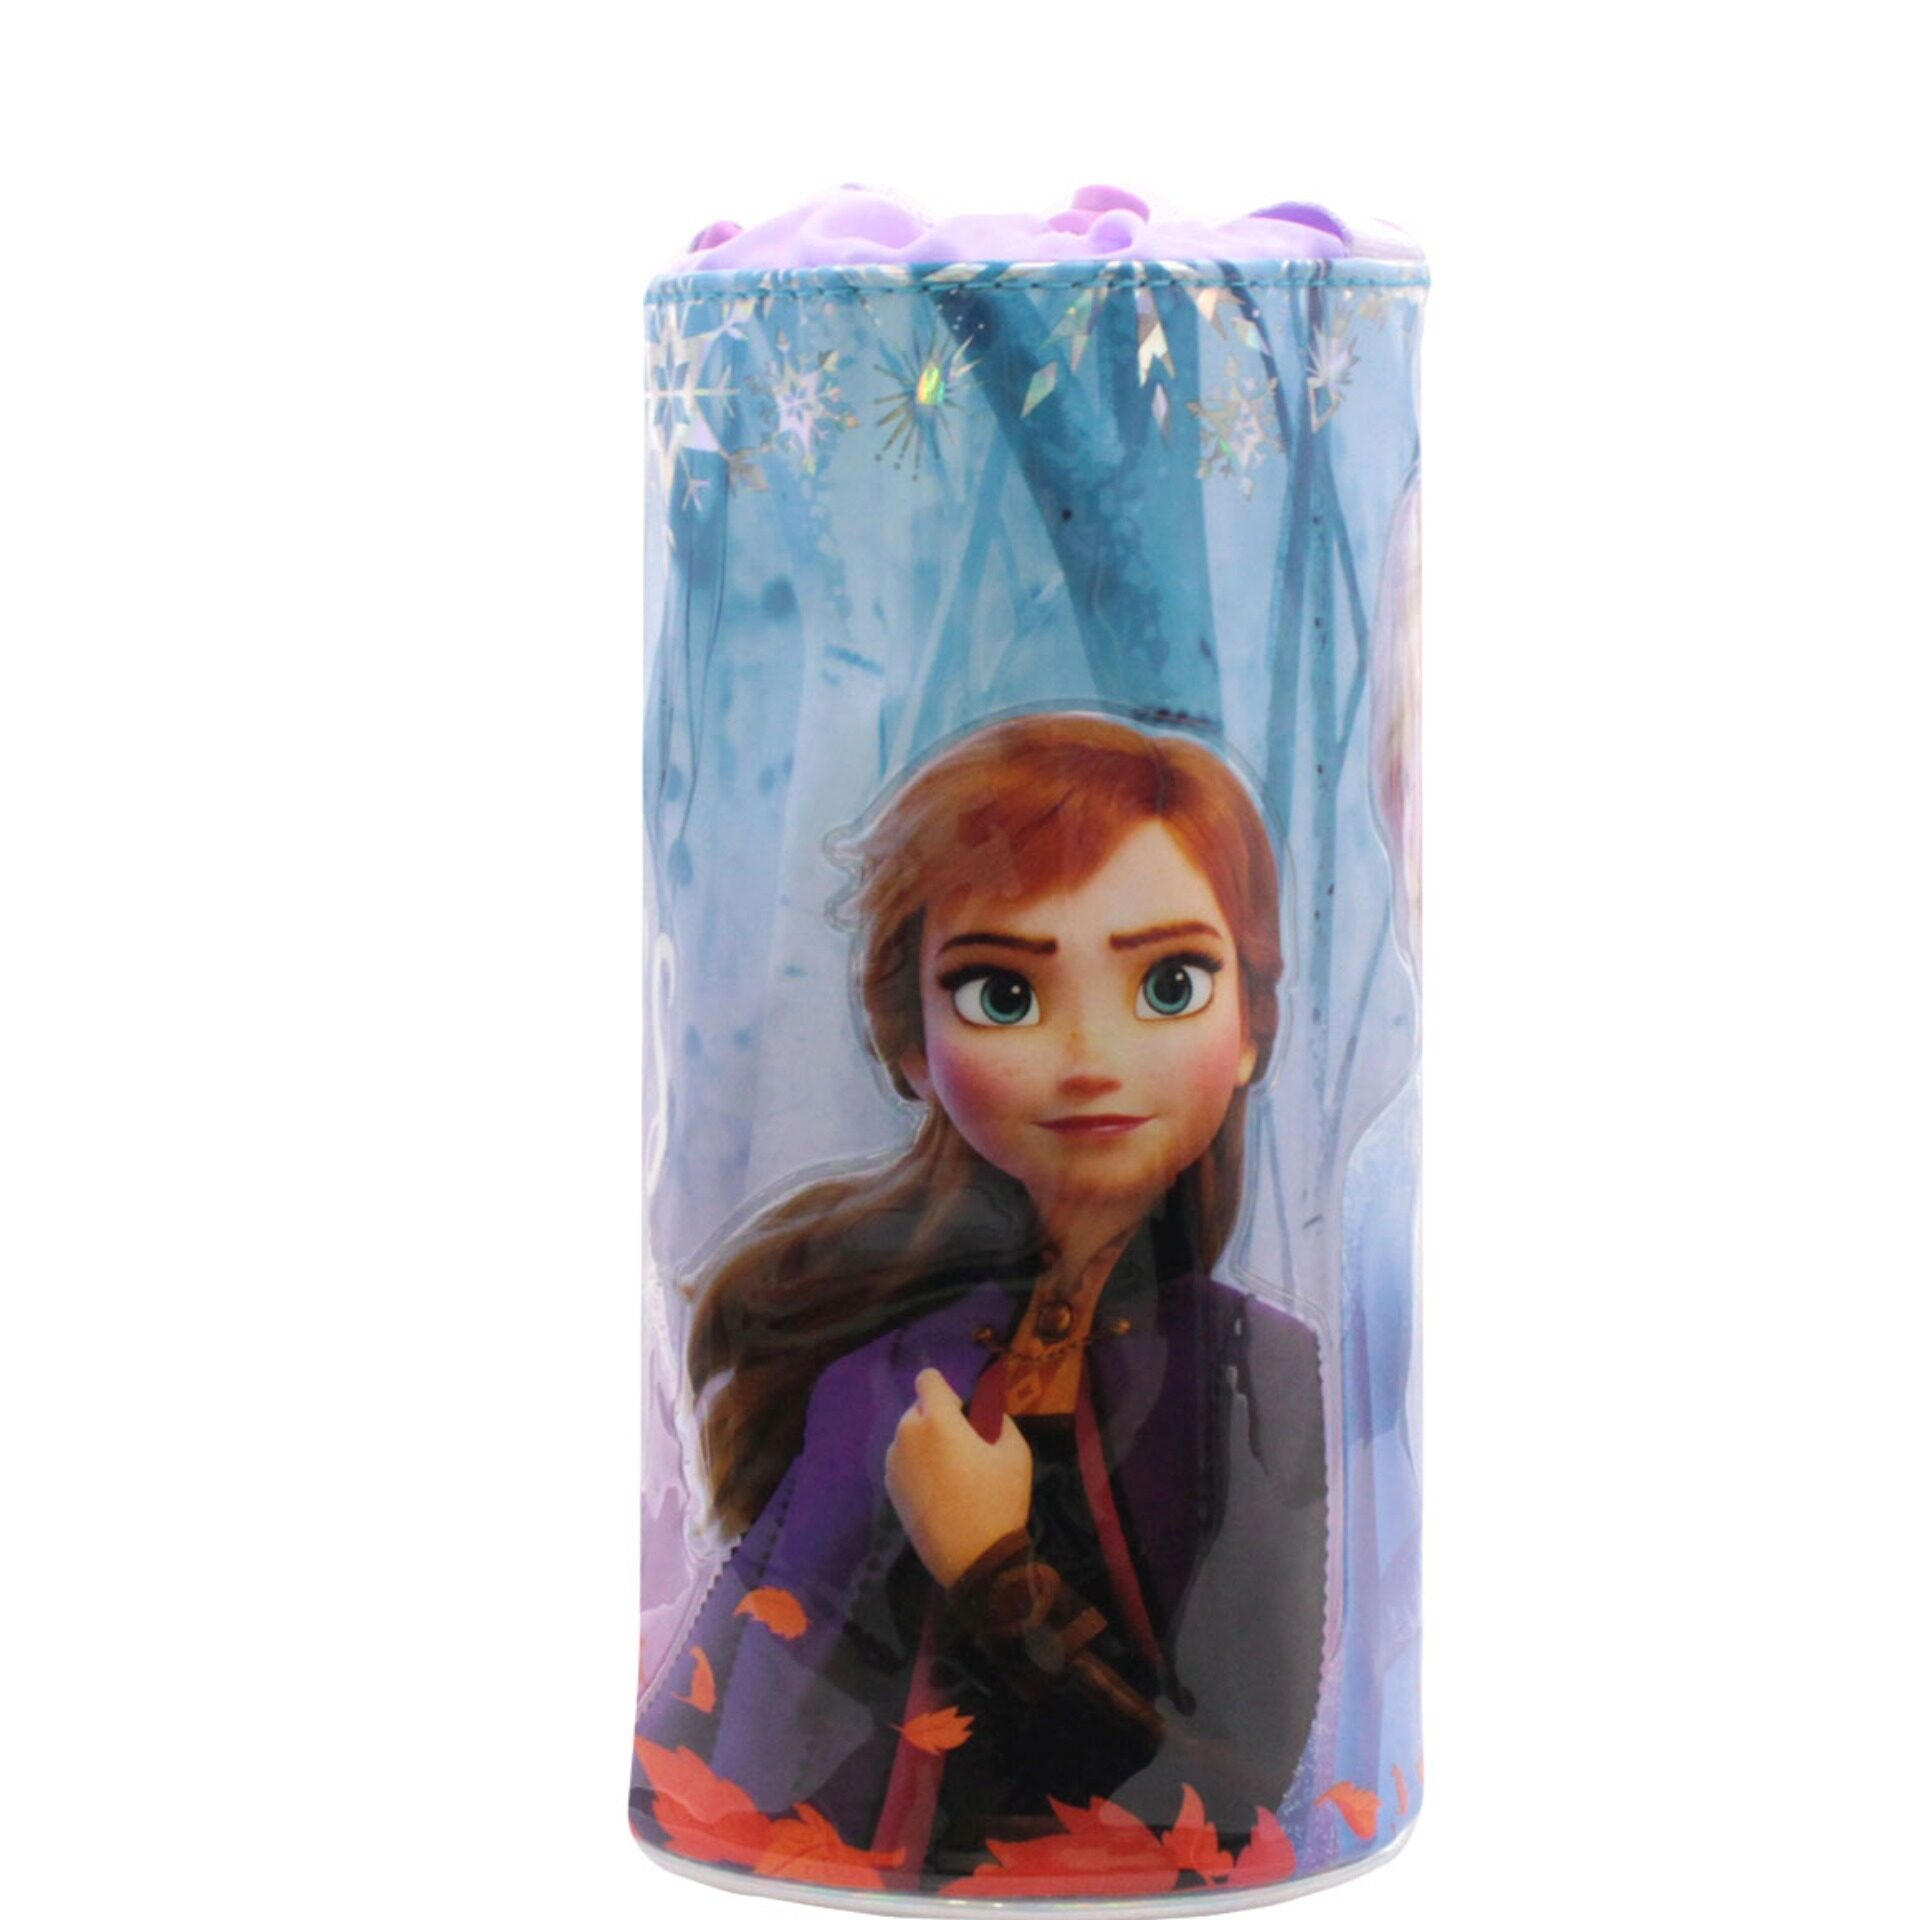 Disney Frozen 2 Princess Elsa & Anna Water Bottle Cover